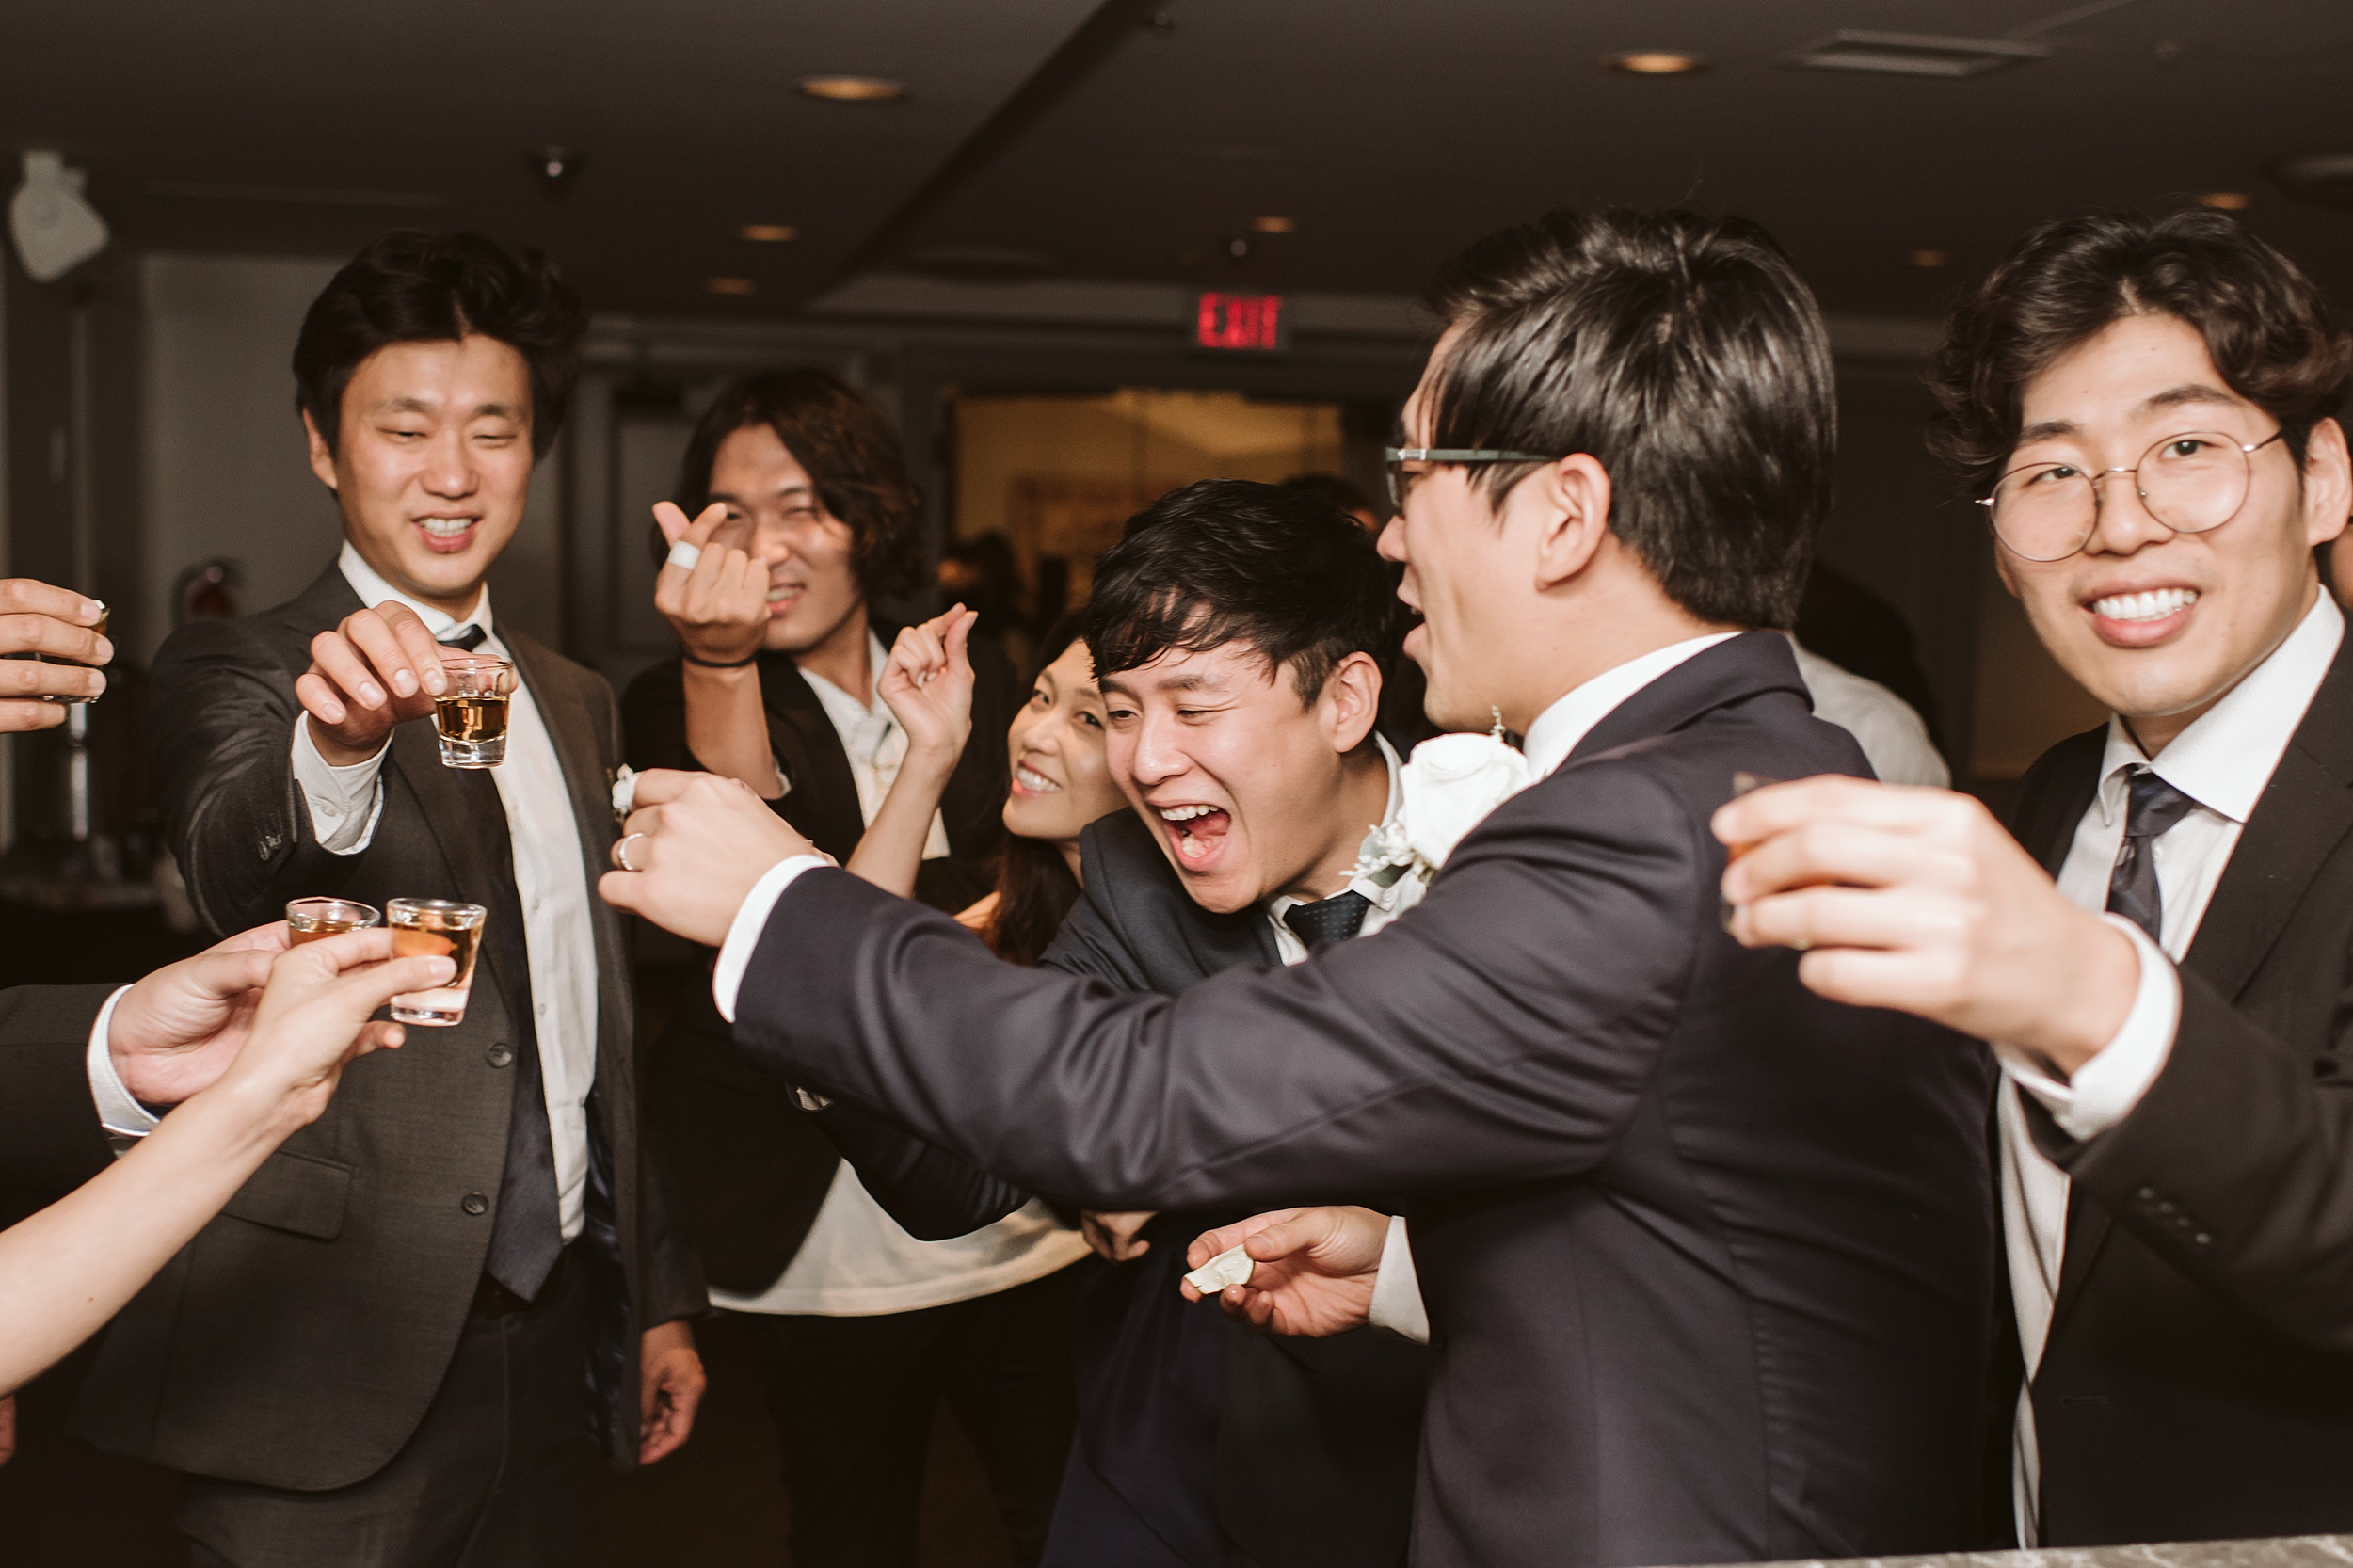 Doctors_House_Kleinburg_Wedding_Toronto_Photographer_0092.jpg